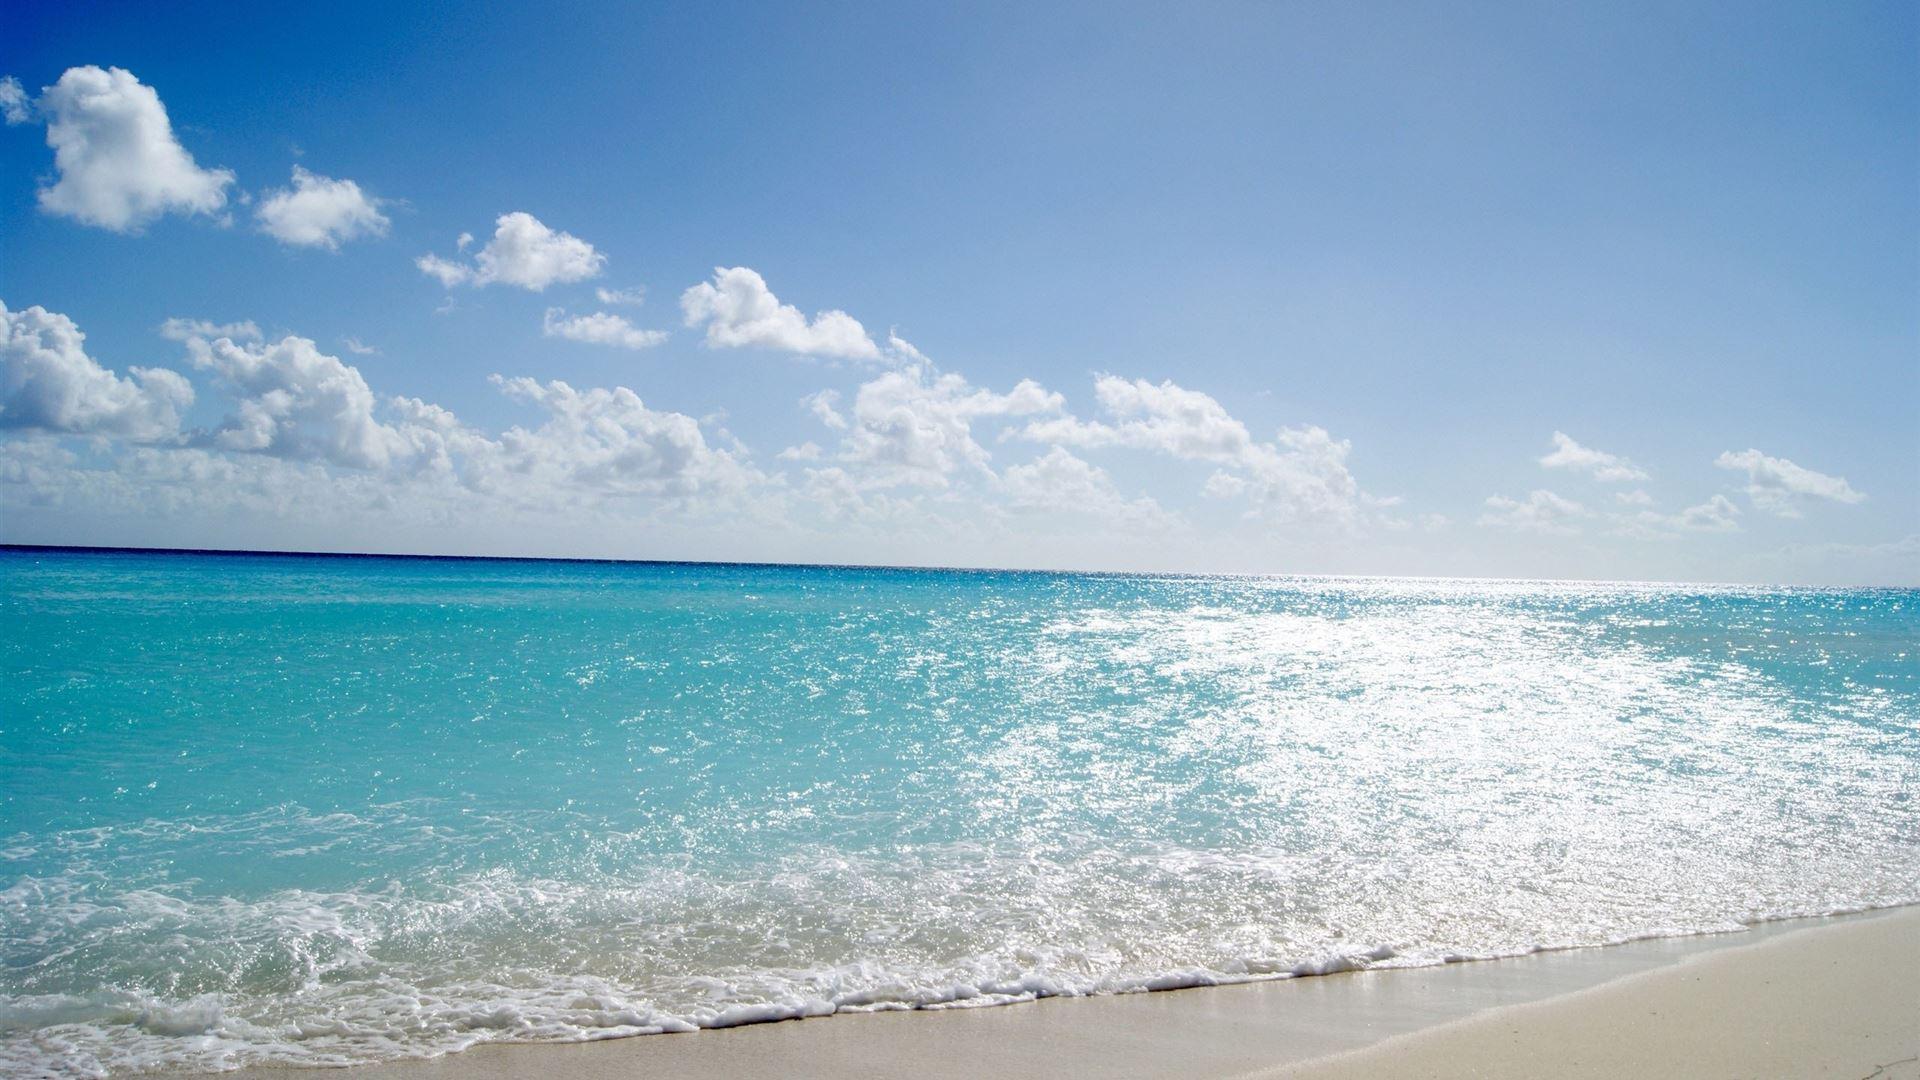 Tropical beach Mac Wallpaper Download | Free Mac ...